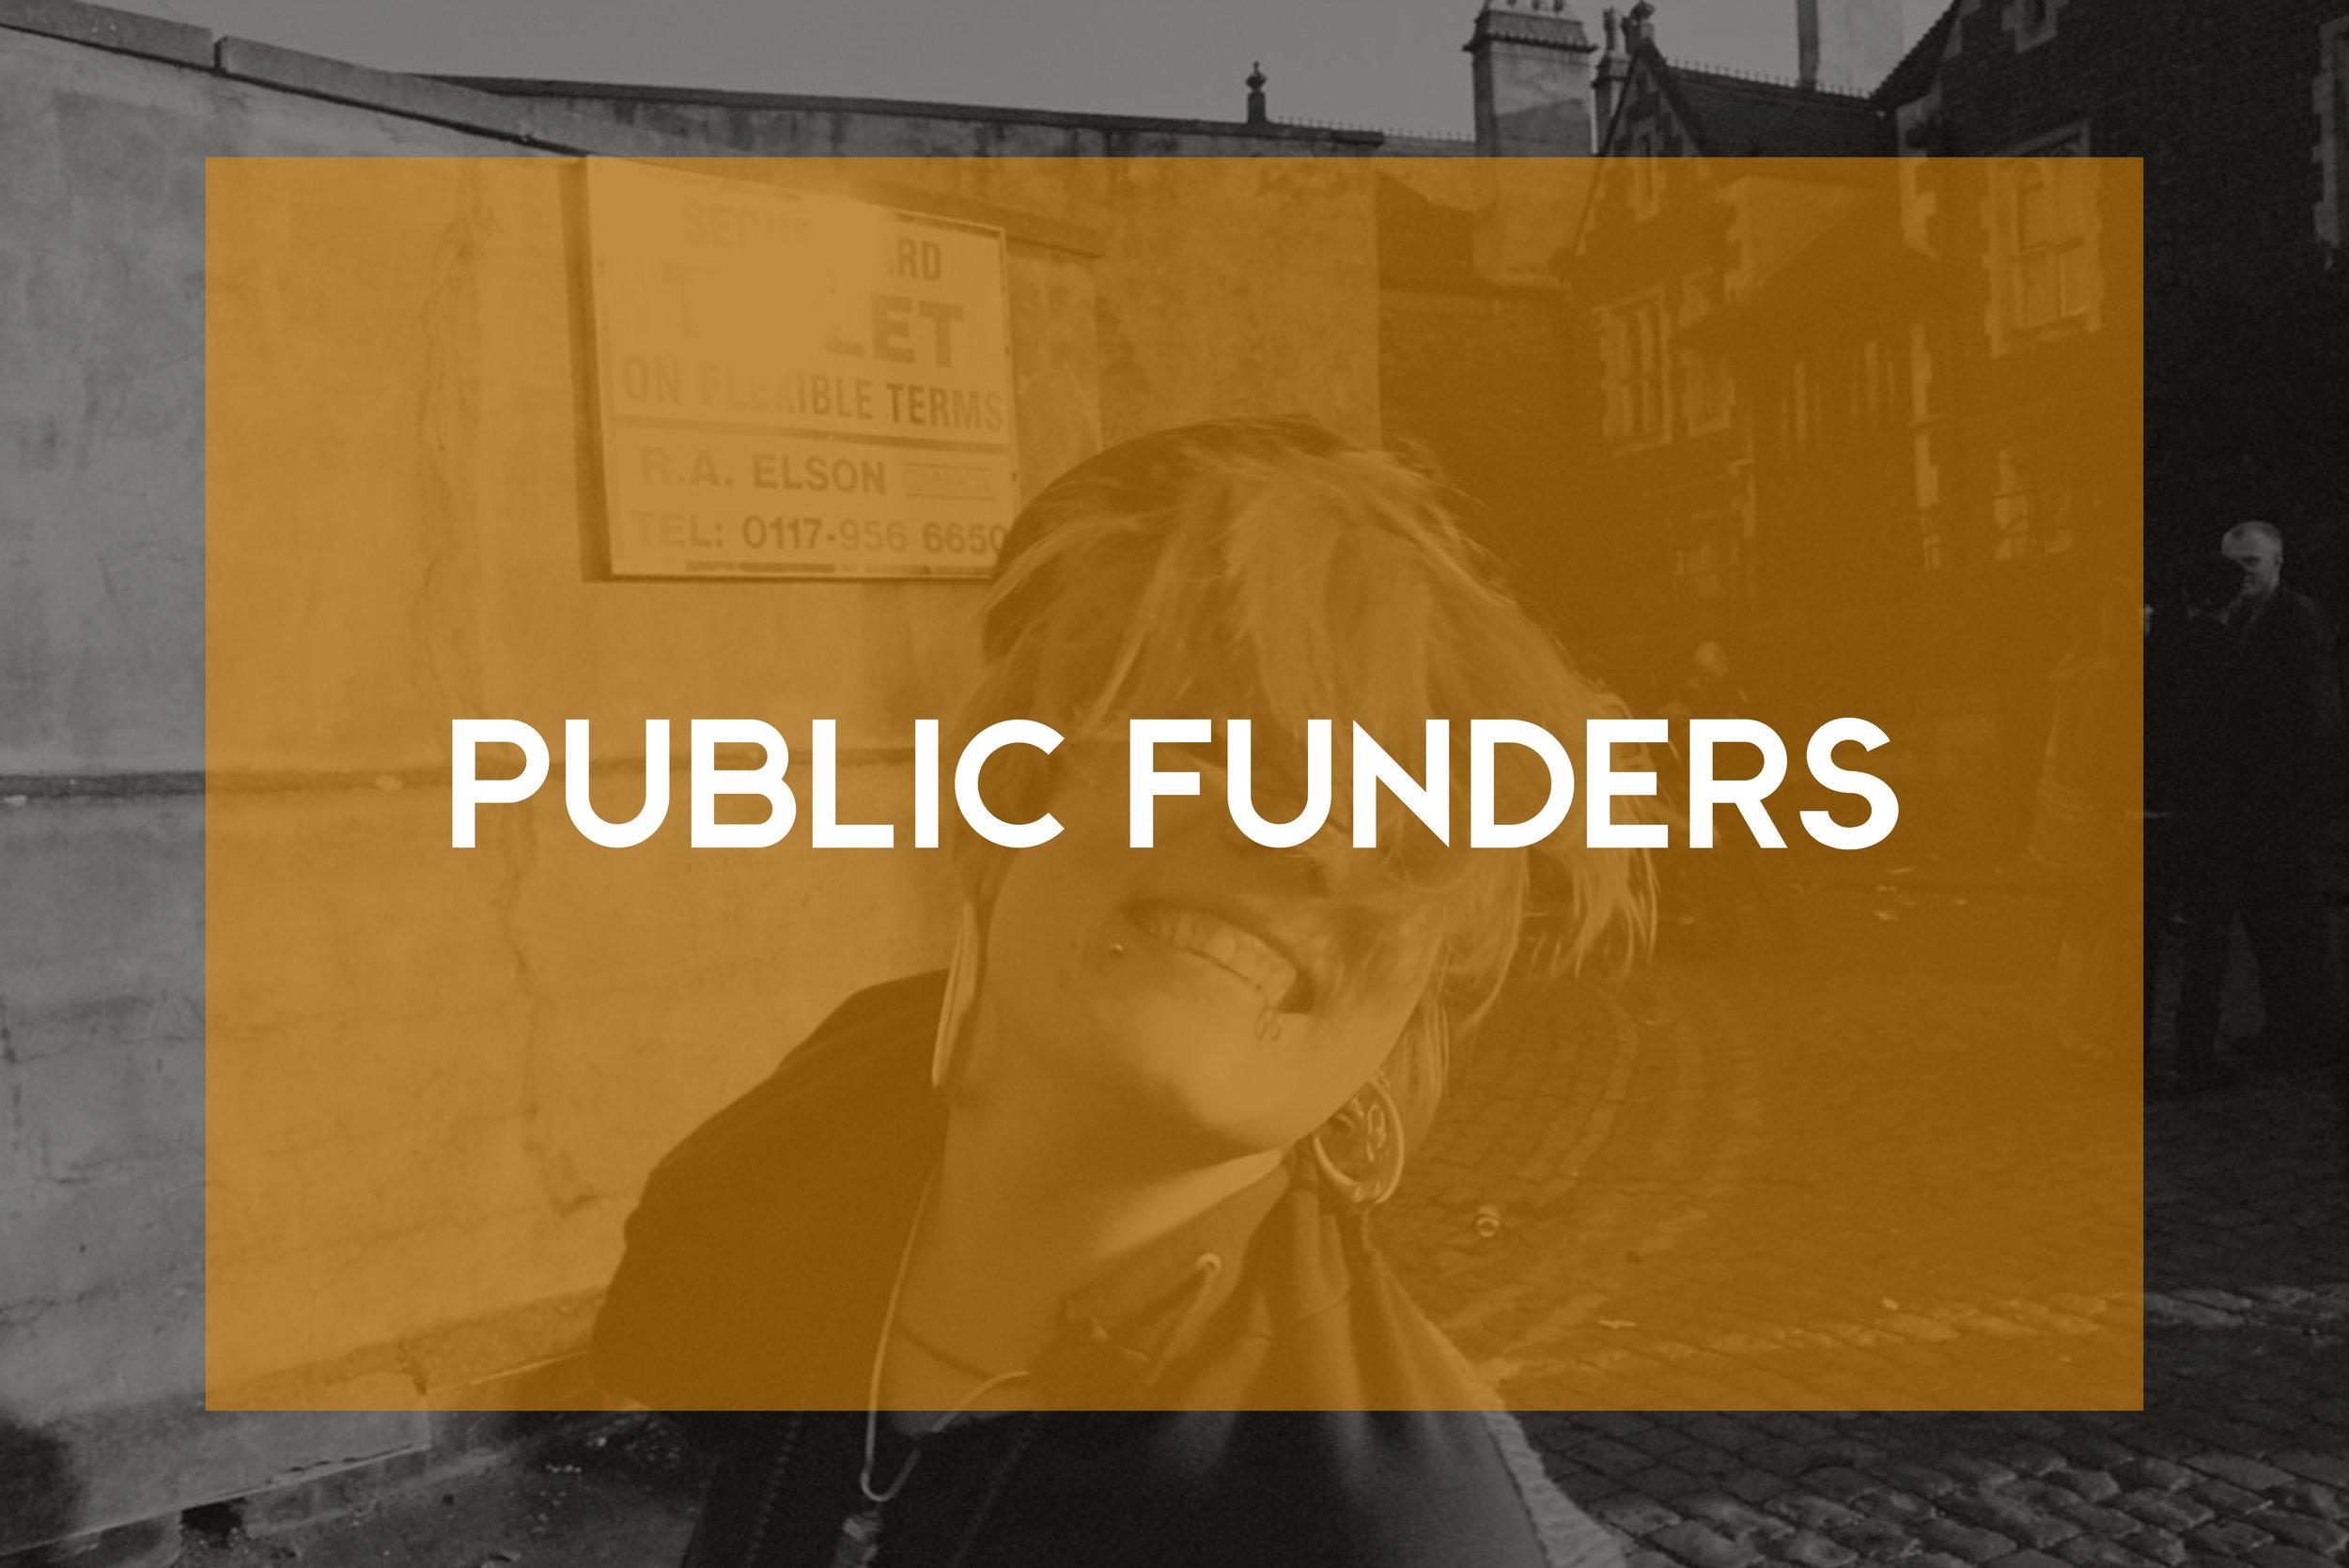 public funders.jpg